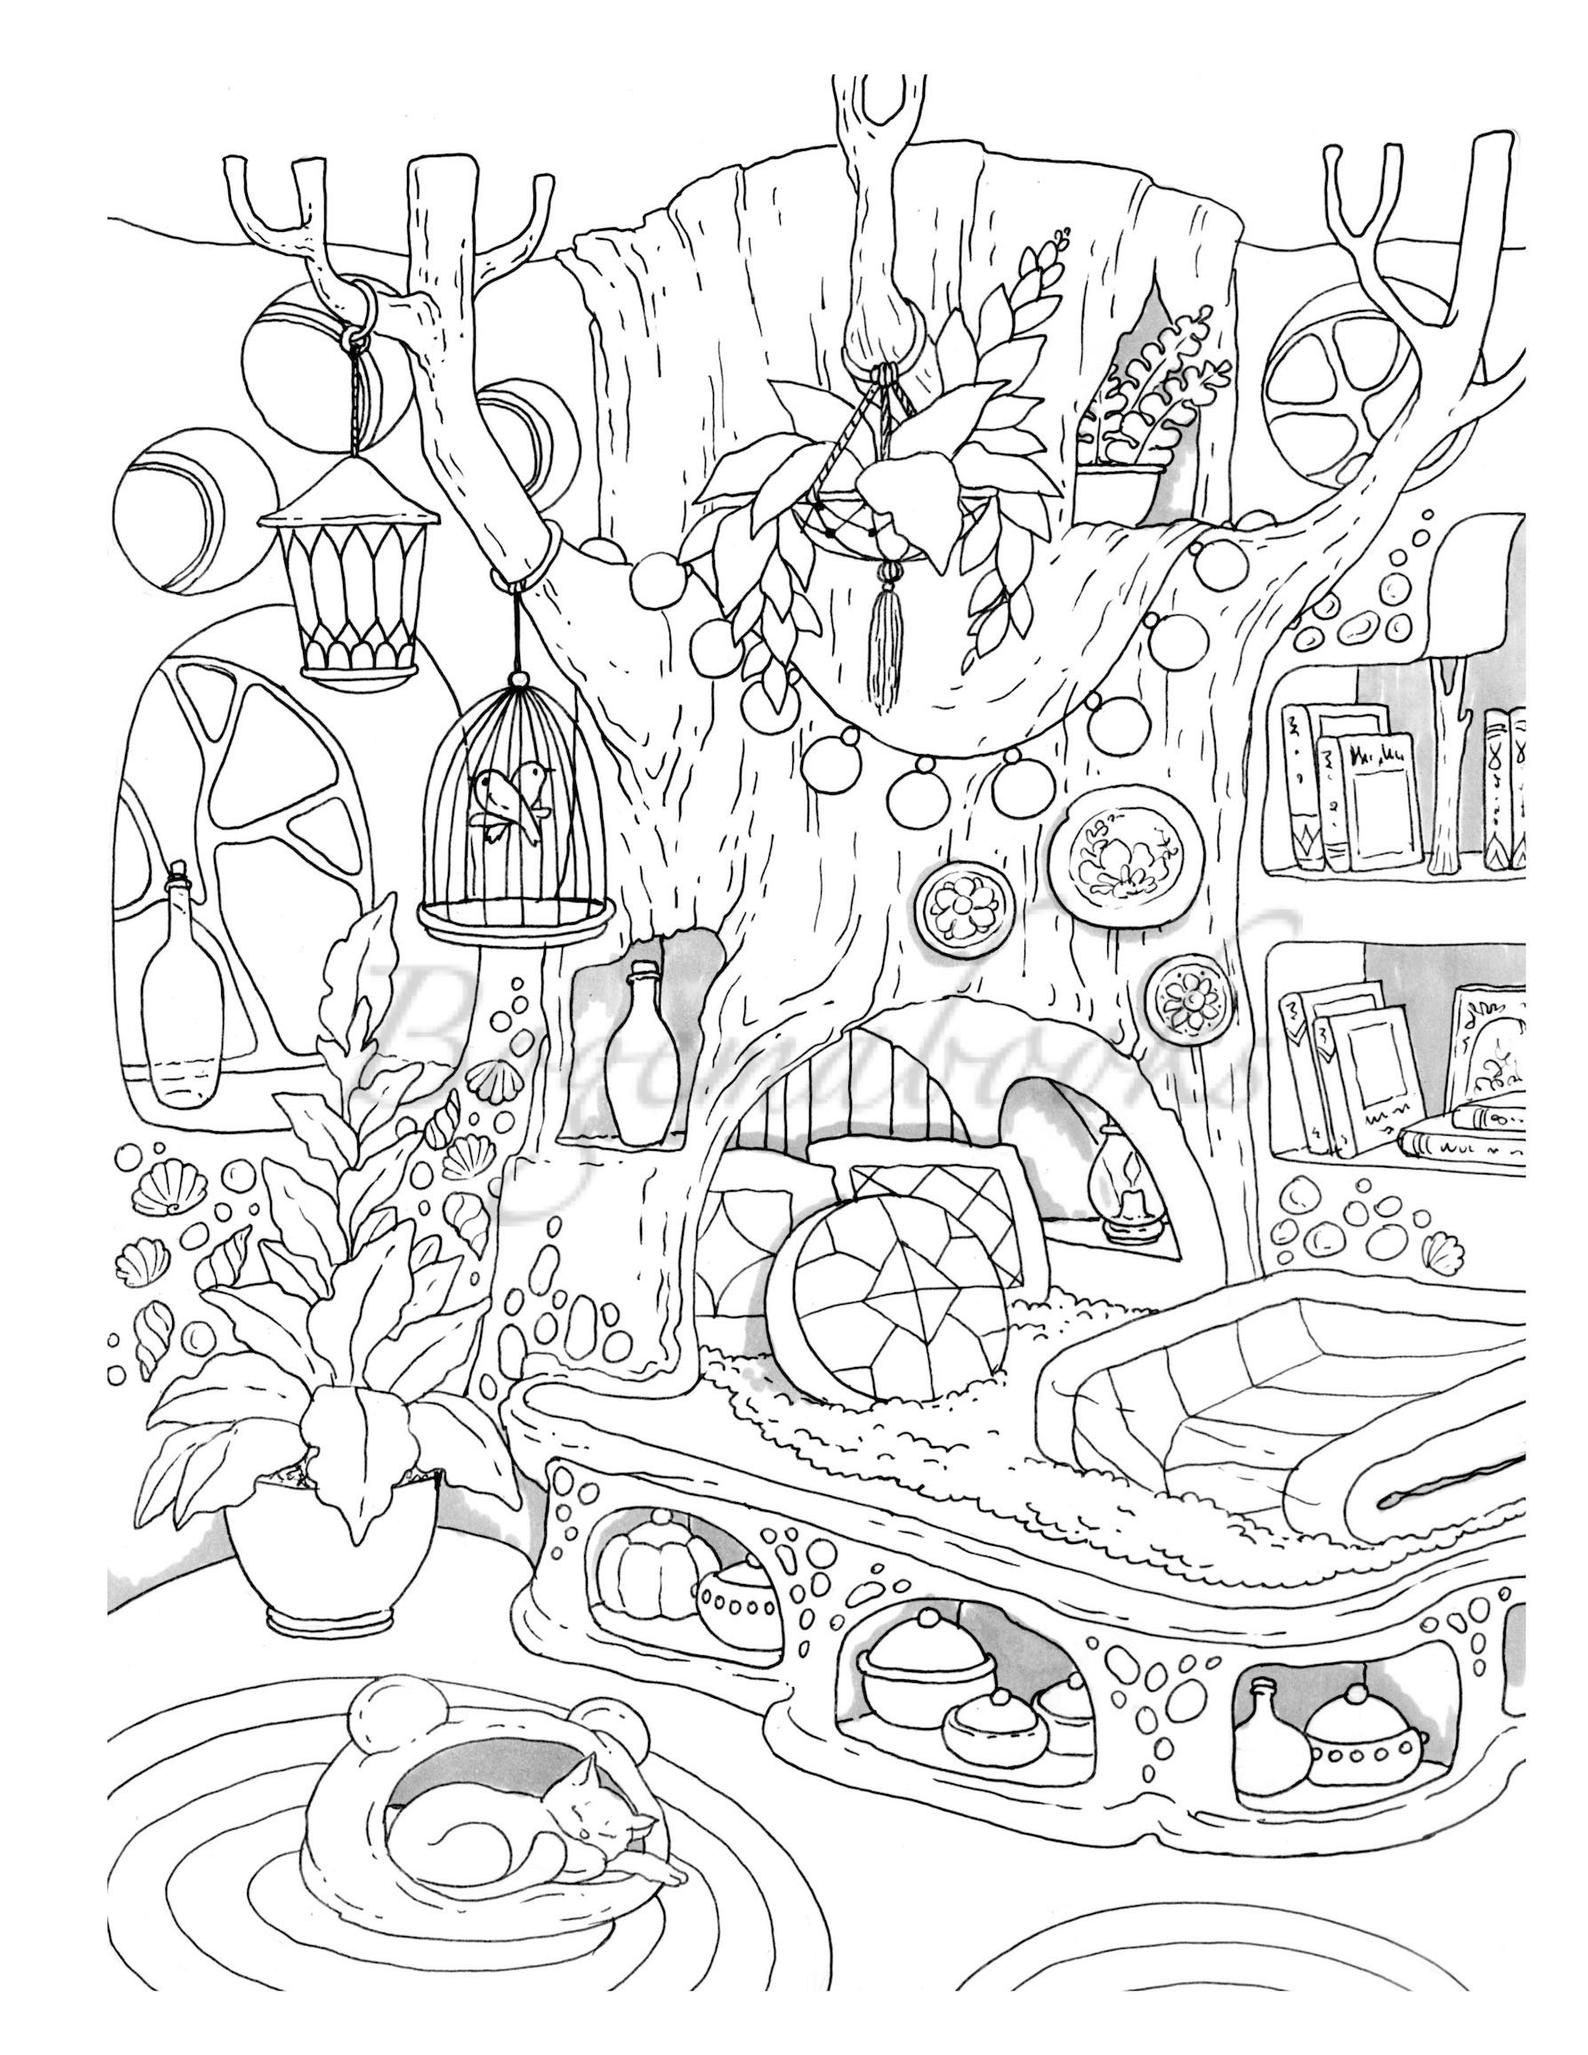 malvorlagen kinder pdf vk  tiffanylovesbooks